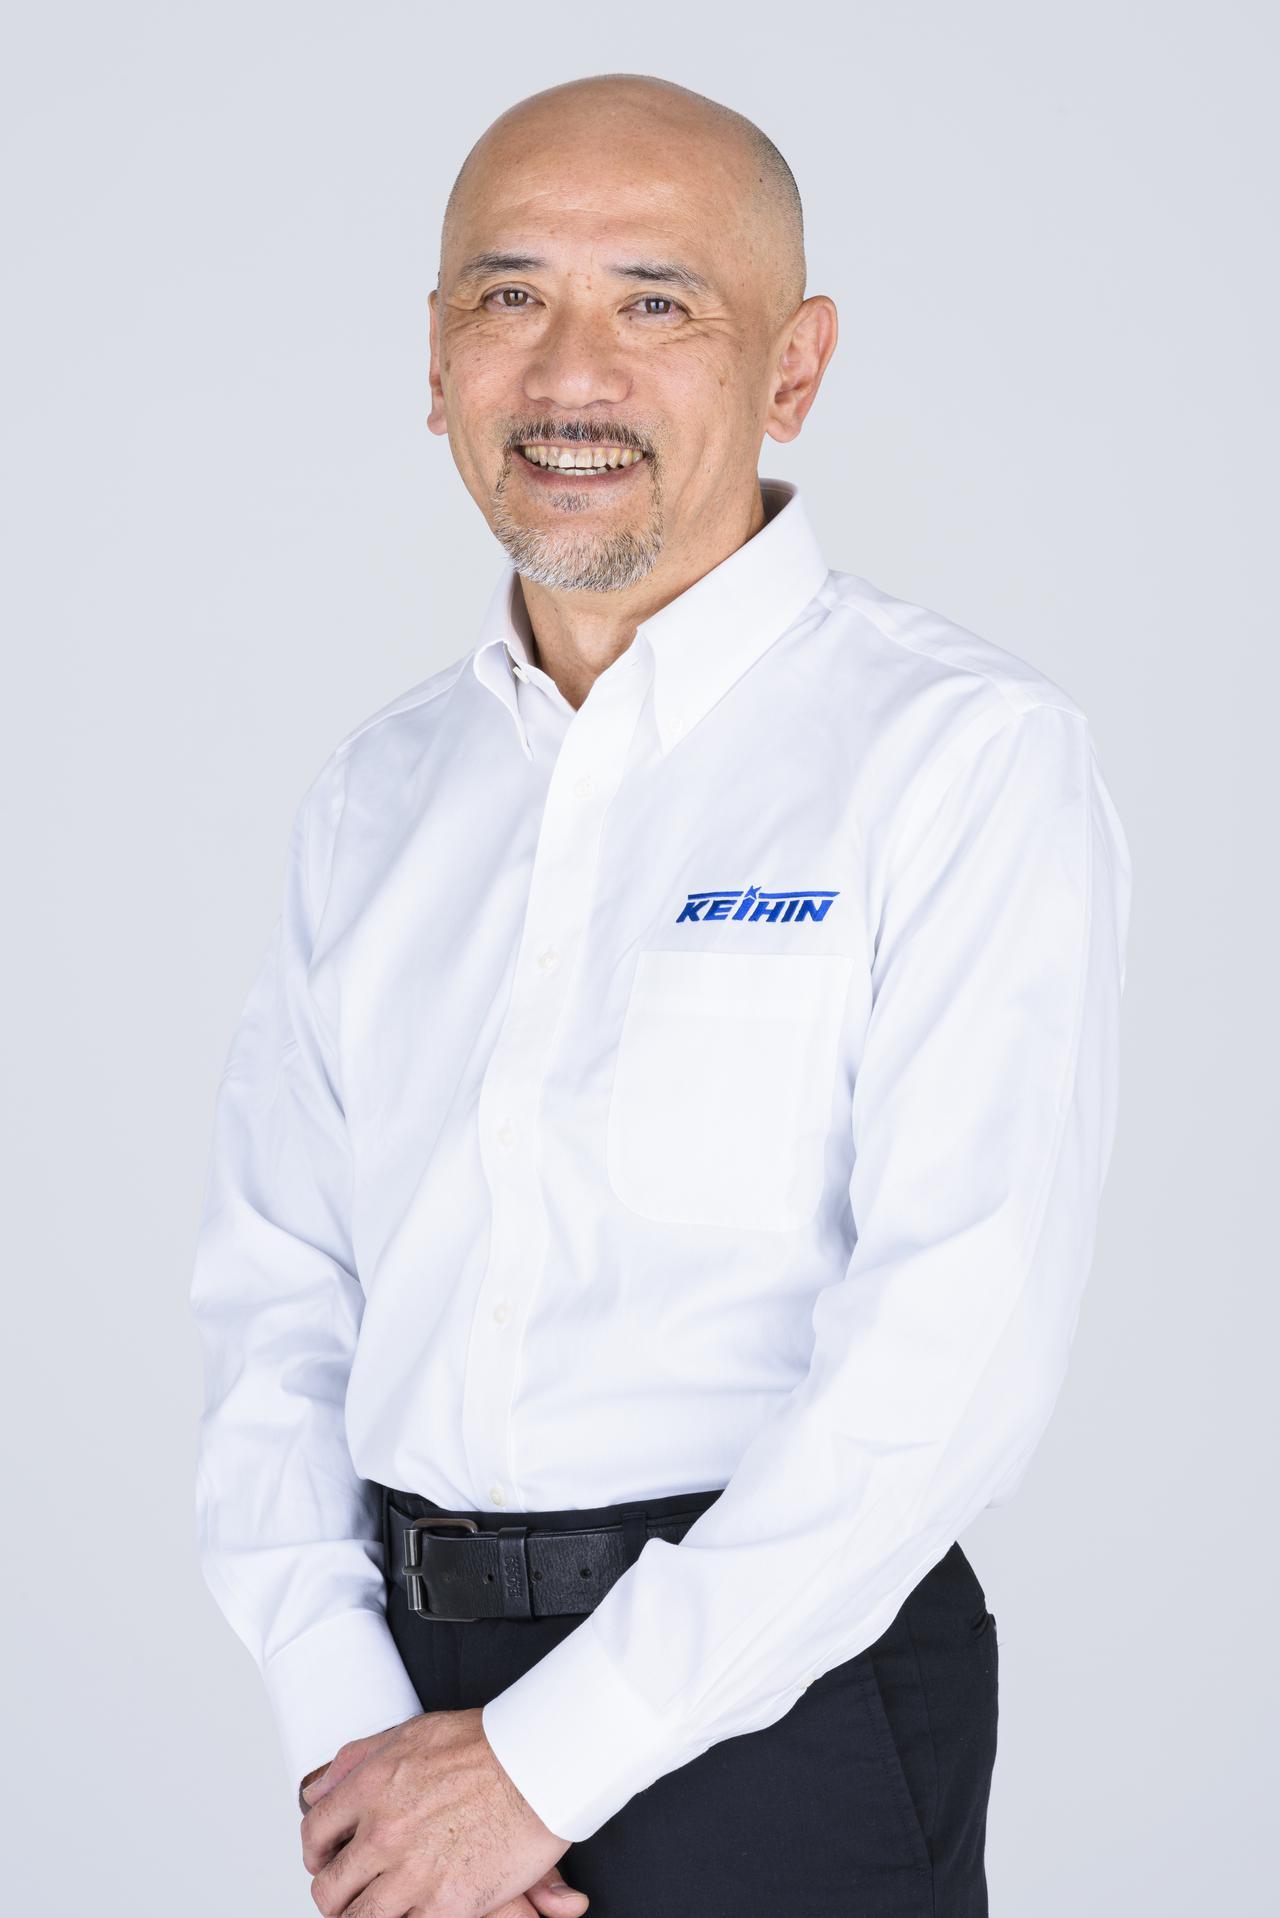 Images : 小原斉 テクニカルディレクター